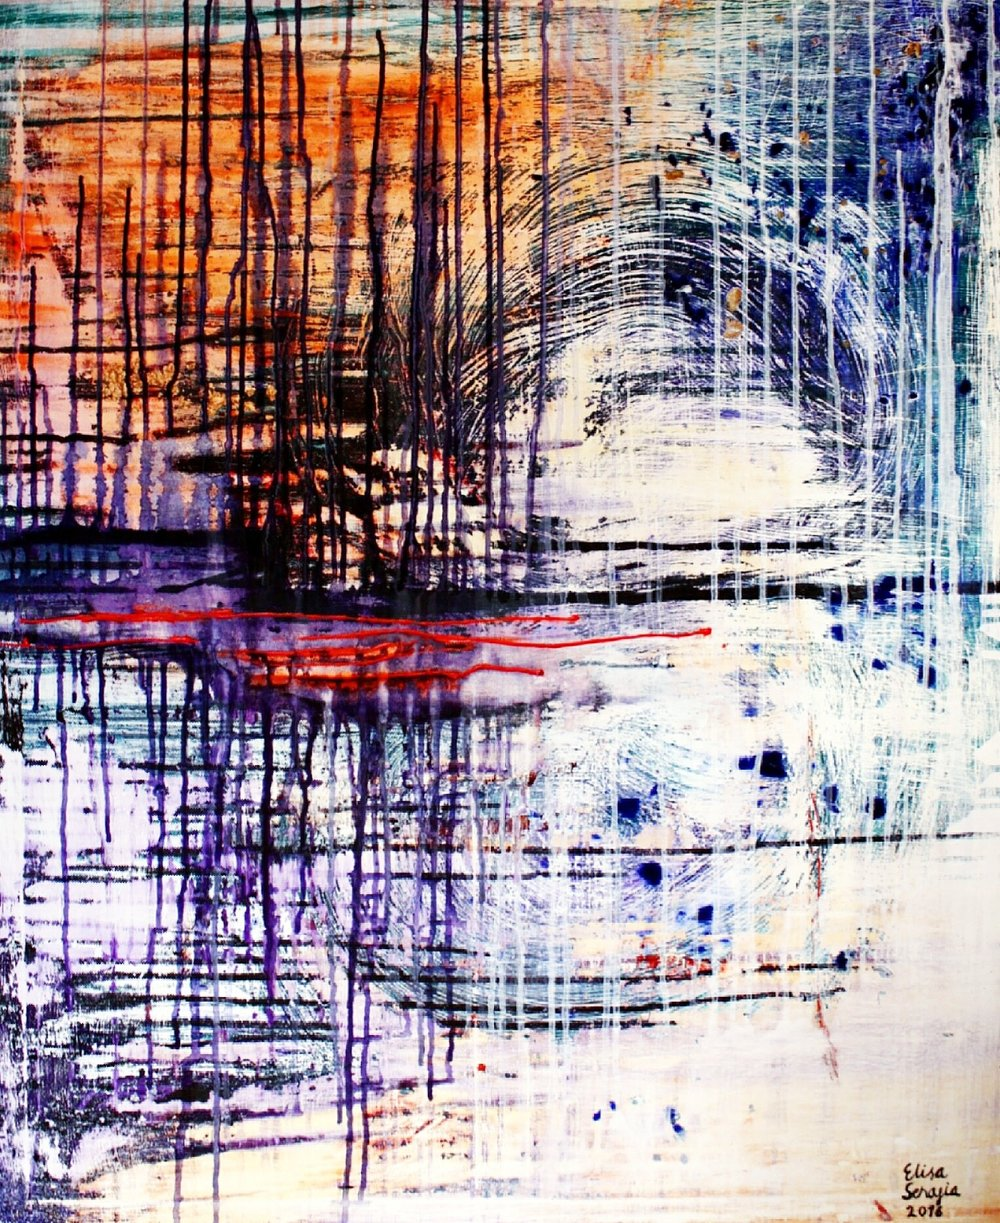 Heijastuksesi on aamun rusko, Akryyli kankaalle, 81 cm x 100 cm  Myyty / Sold